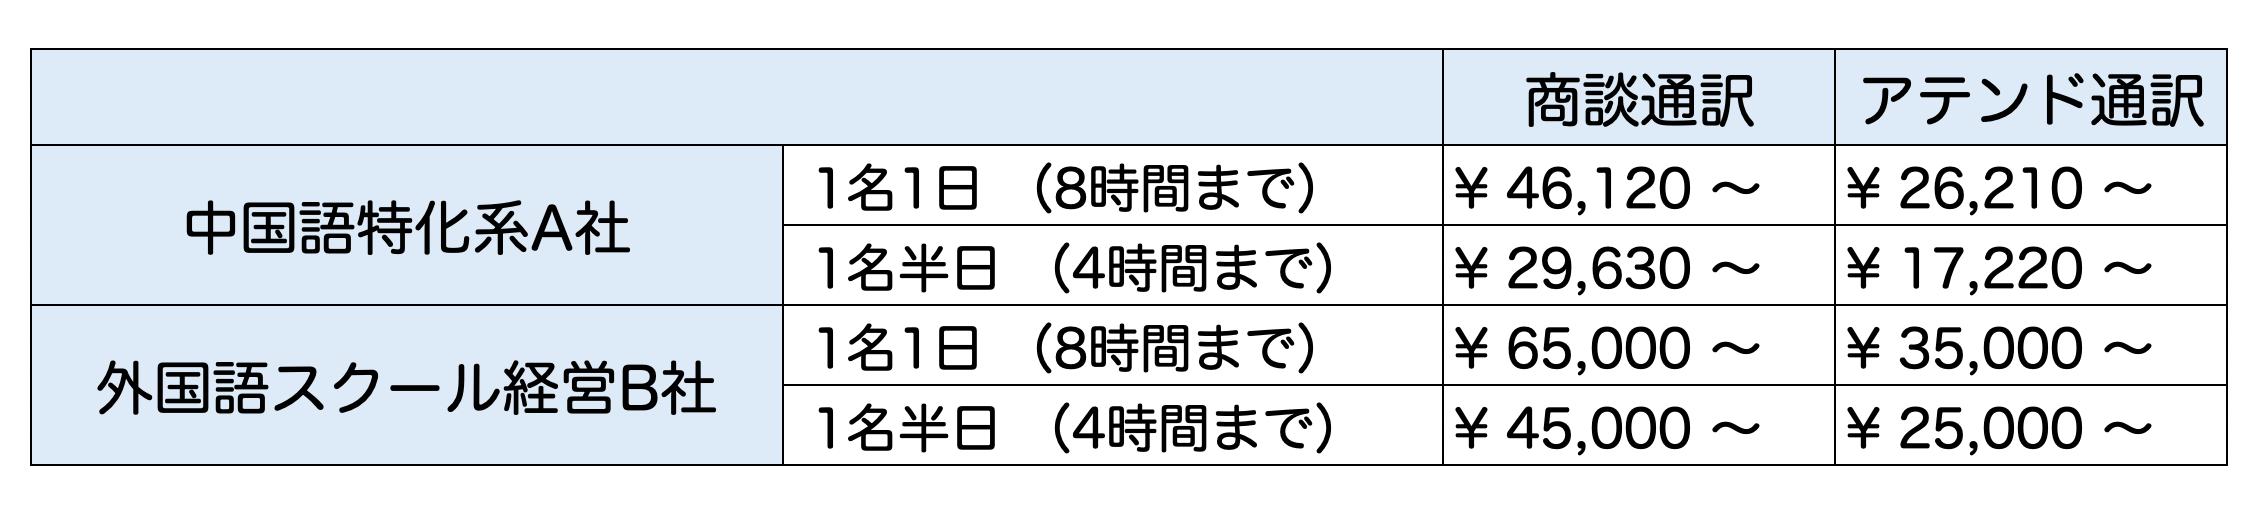 Ryokinhyo (1)